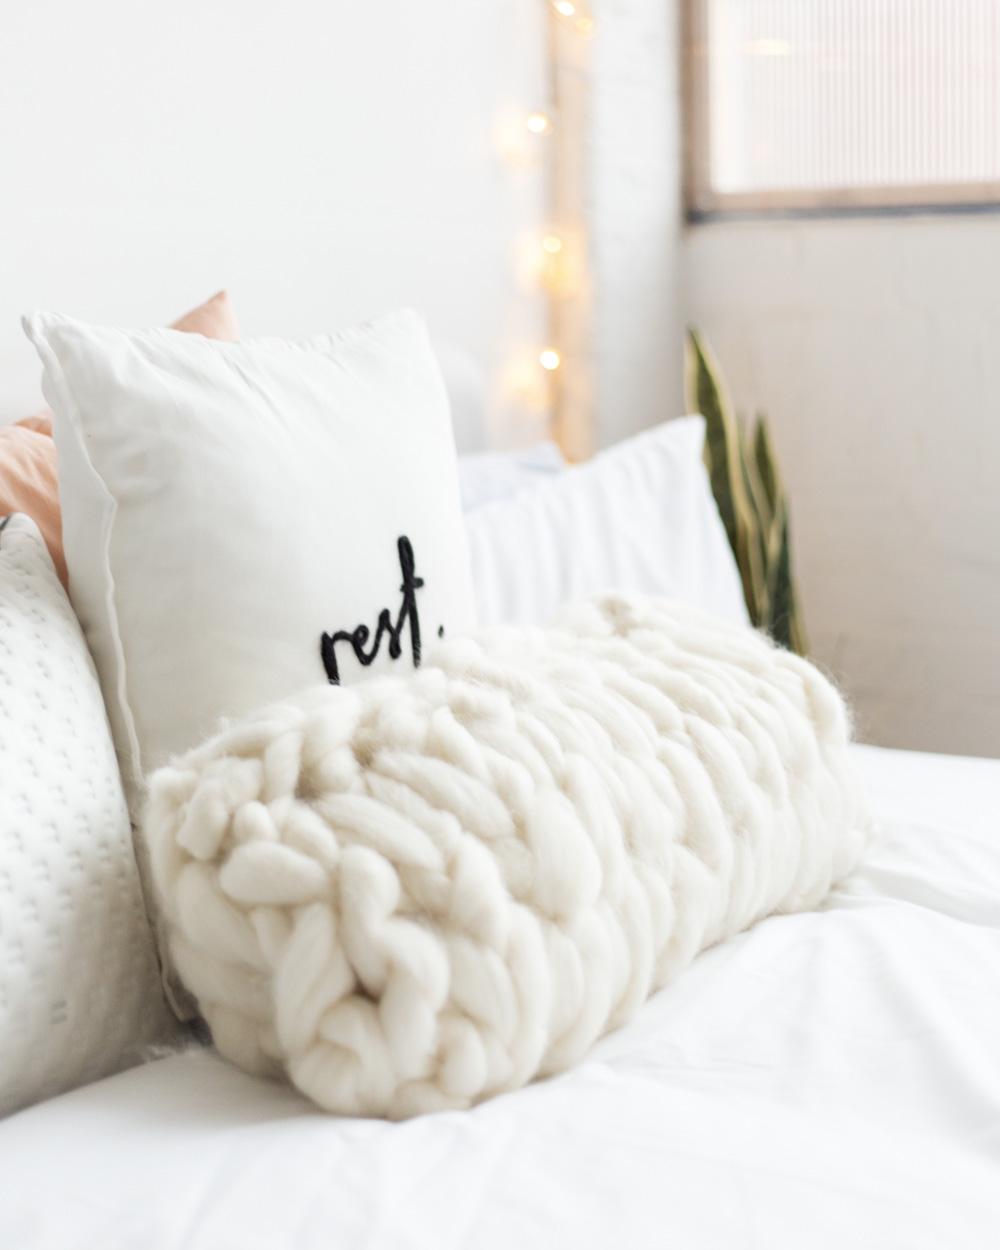 diy pinterest chambre coussin tricot